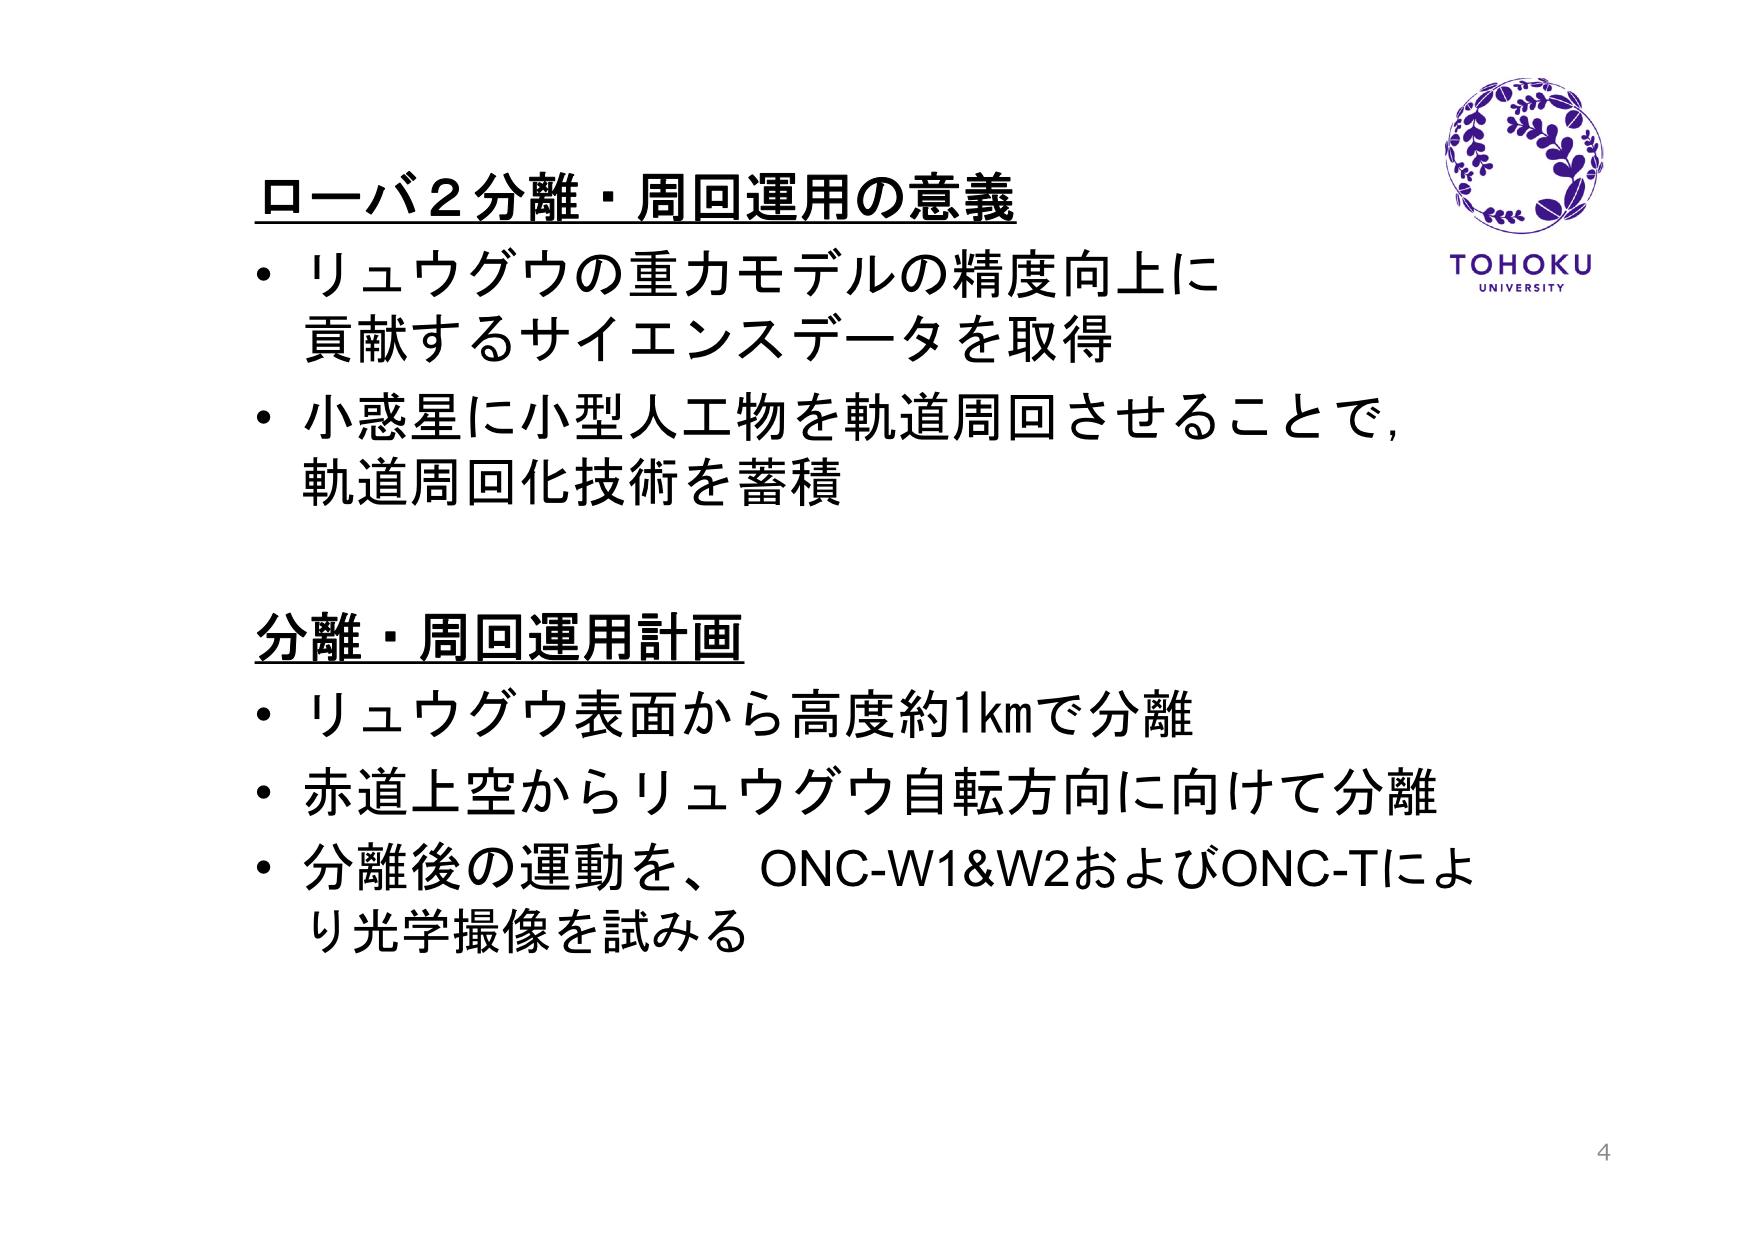 f:id:Imamura:20190924122658p:plain